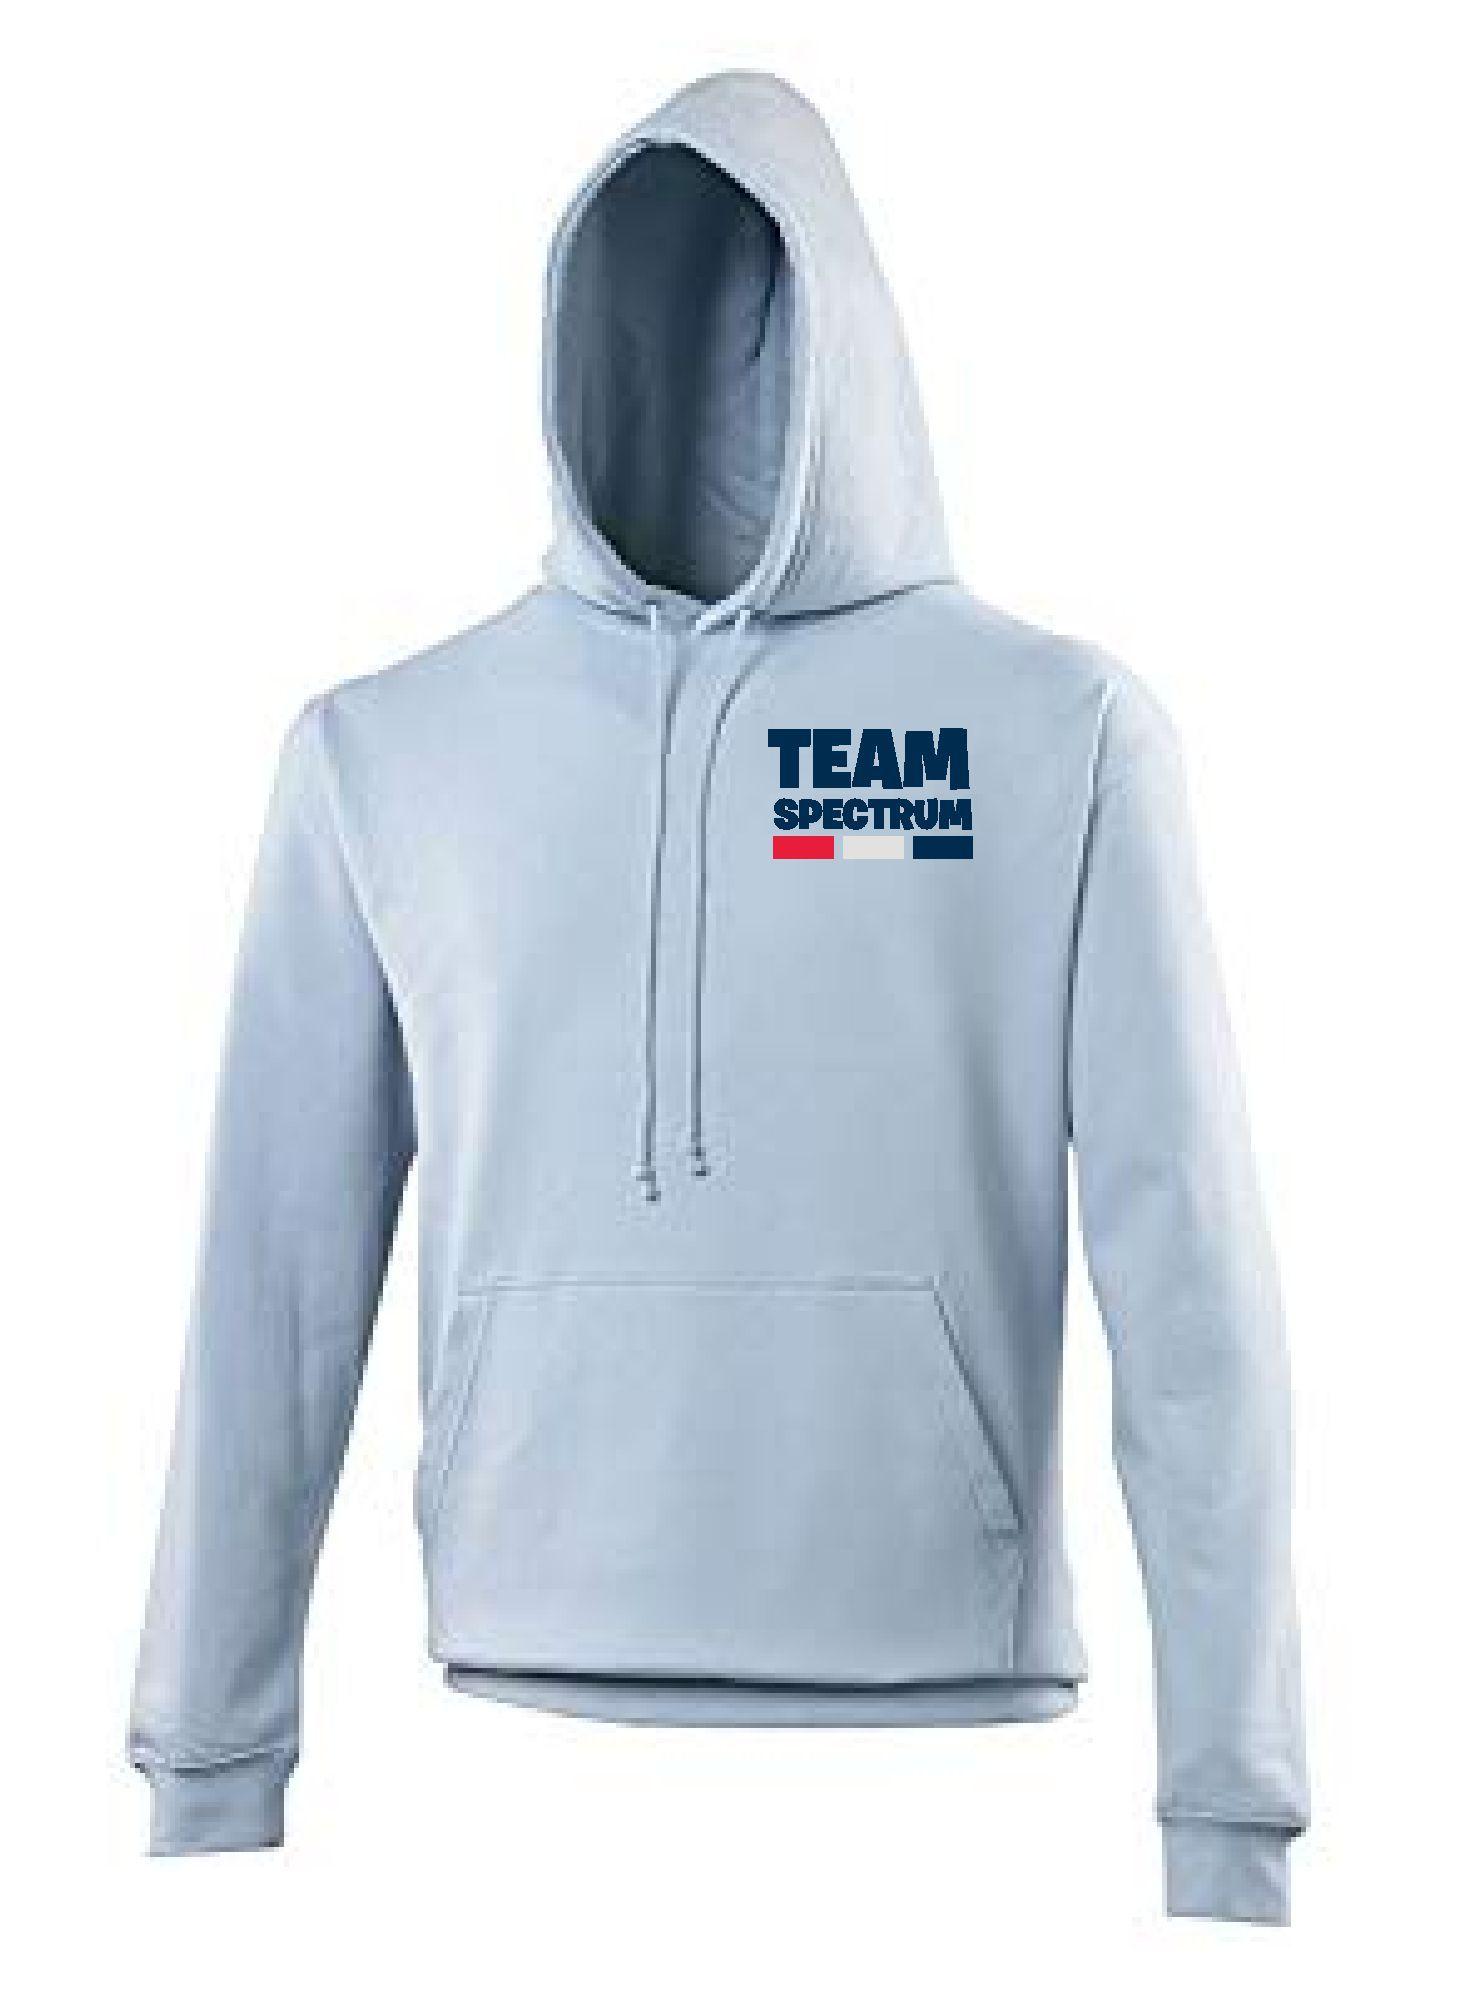 Team Spectrum - Hoodie (Unisex)